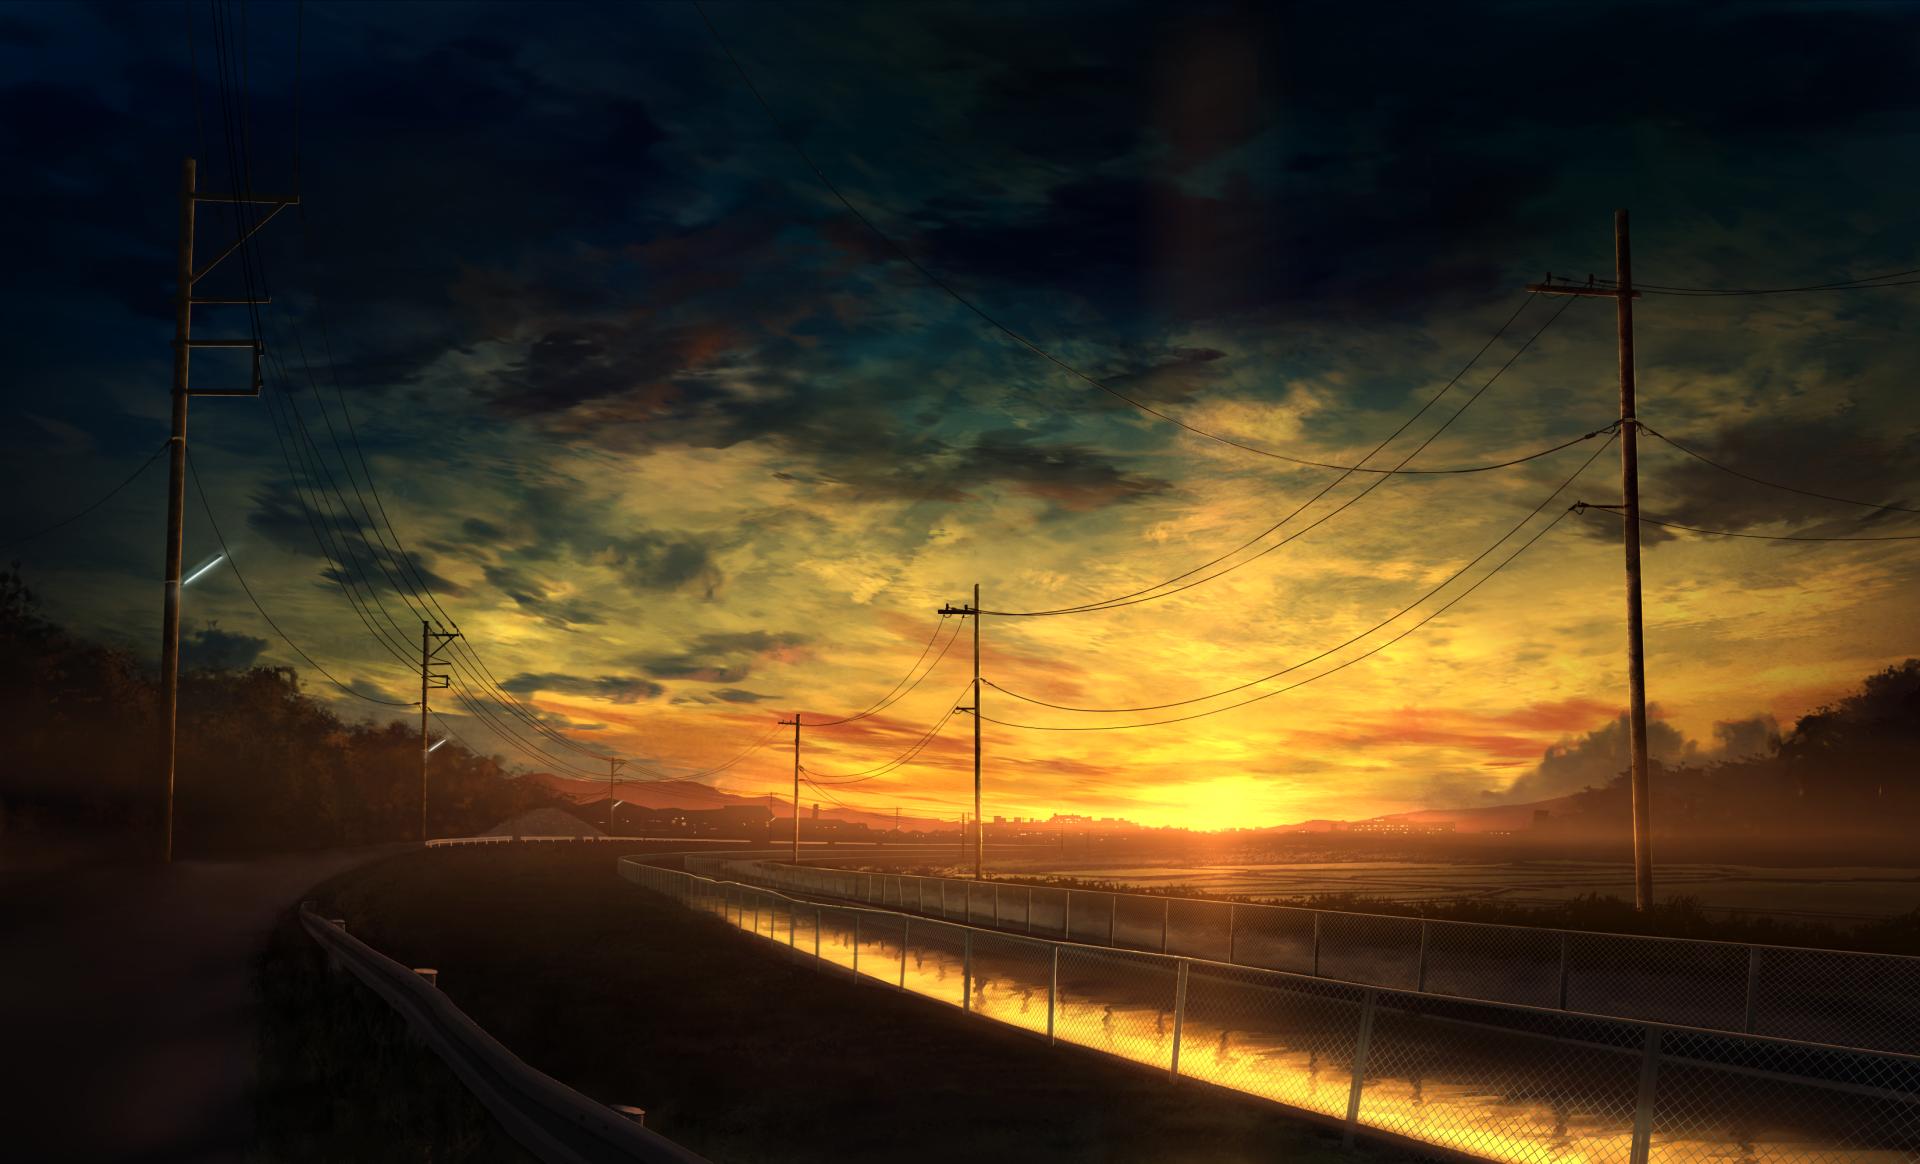 General 1920x1164 clouds landscape road sky sunset water anime Sun sunlight power lines dark